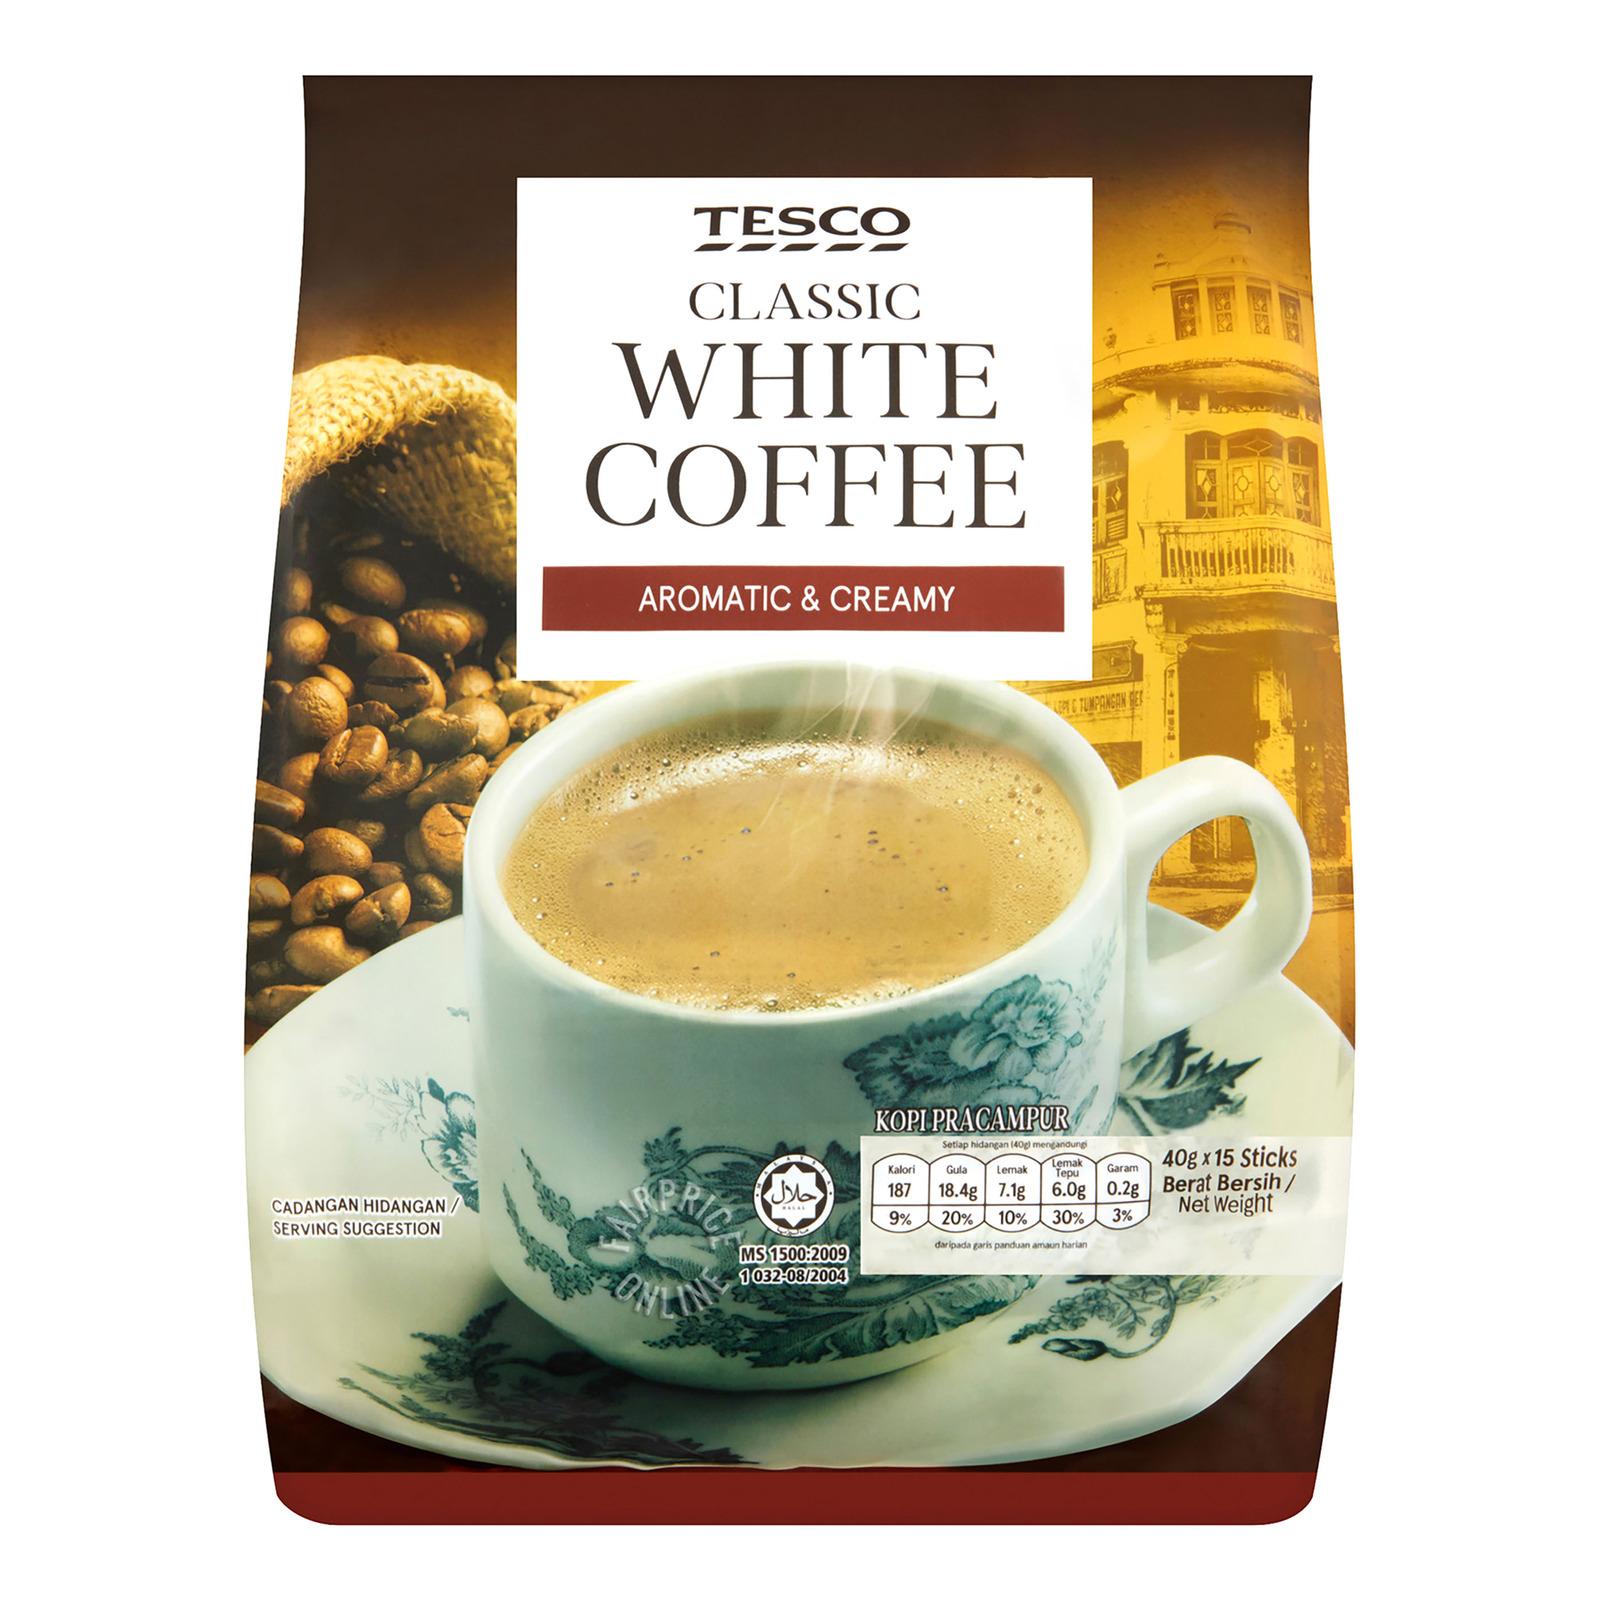 Tesco 3 in 1 Instant White Coffee - Original